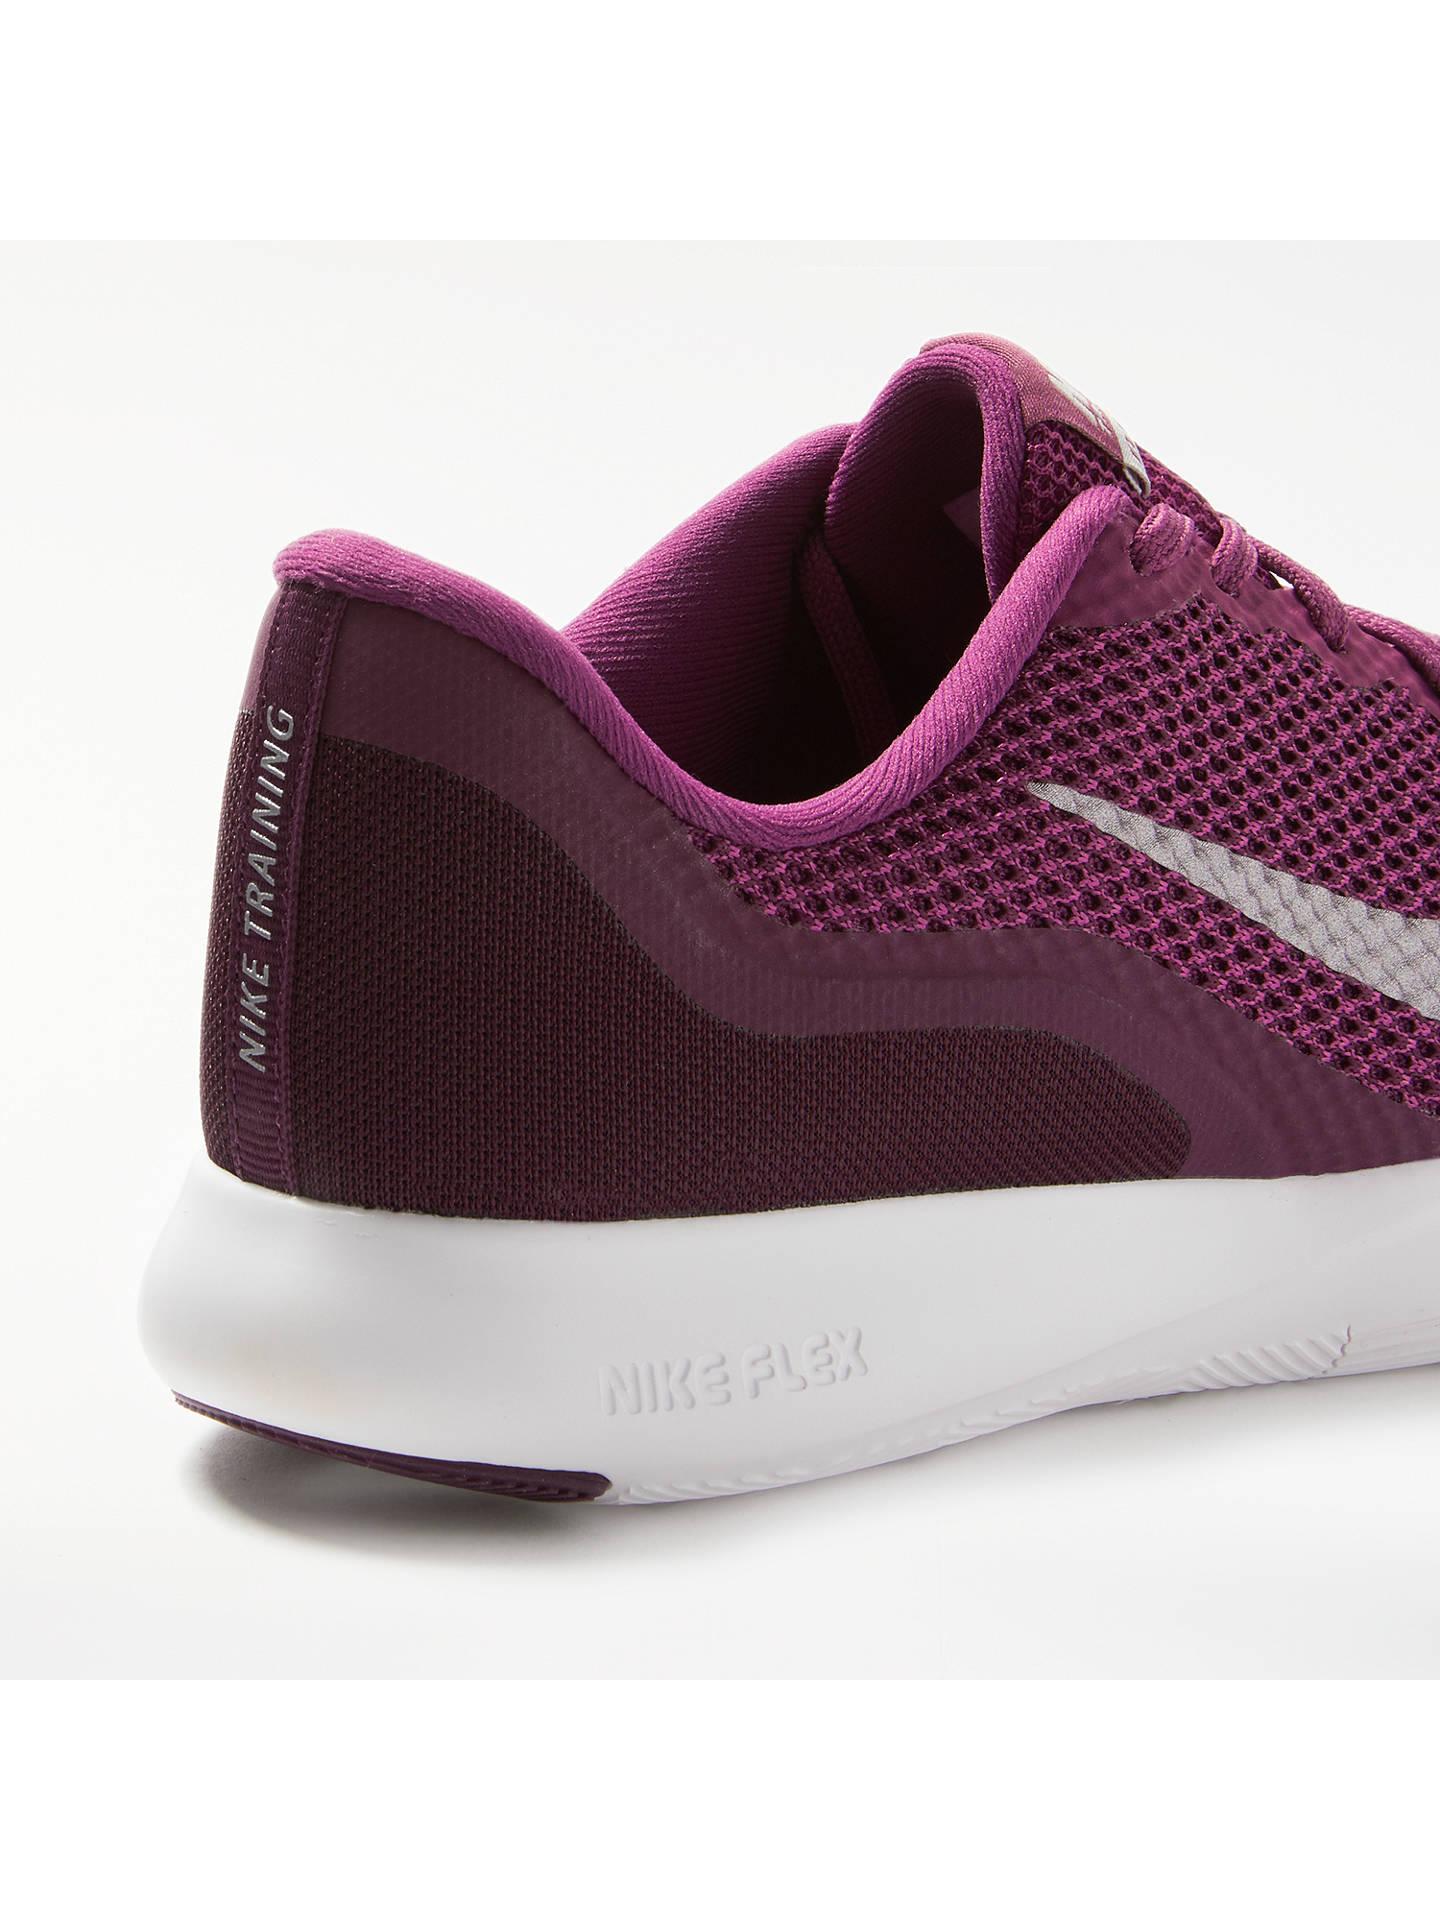 c56dd487b681 ... Buy Nike Flex TR 7 Women s Training Shoes